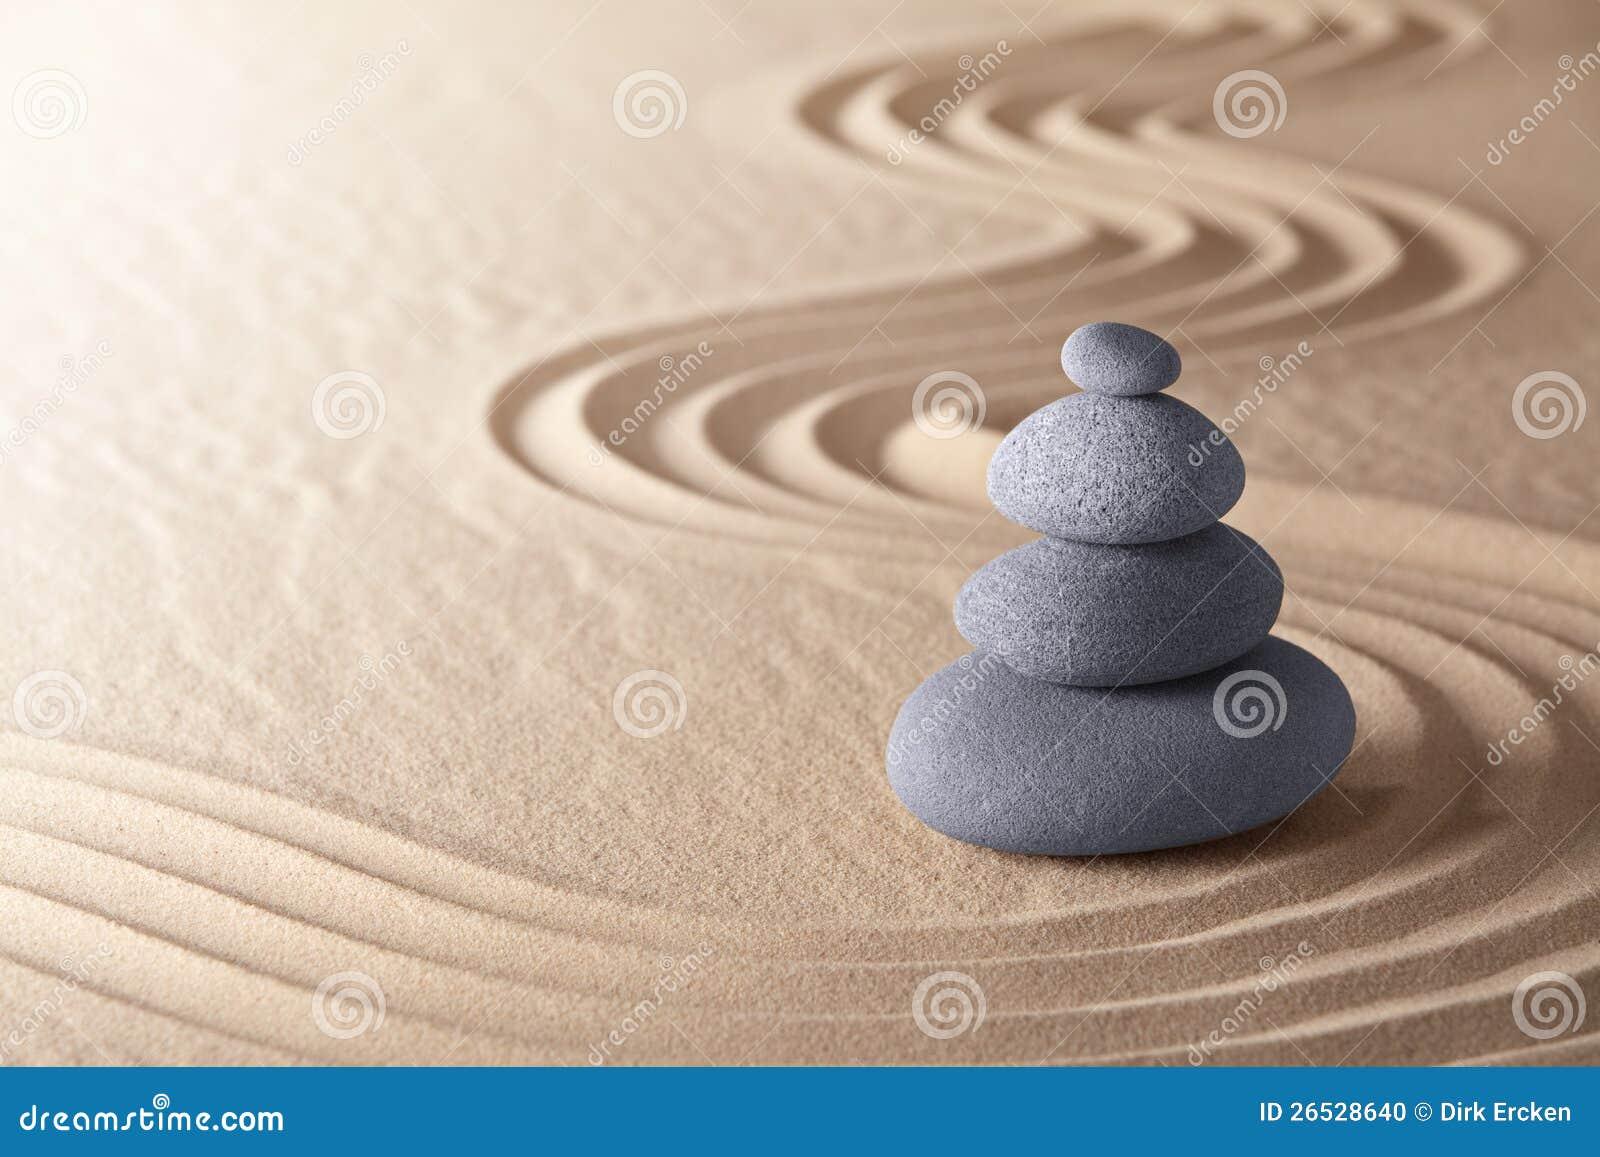 Zen meditation garden balance stones